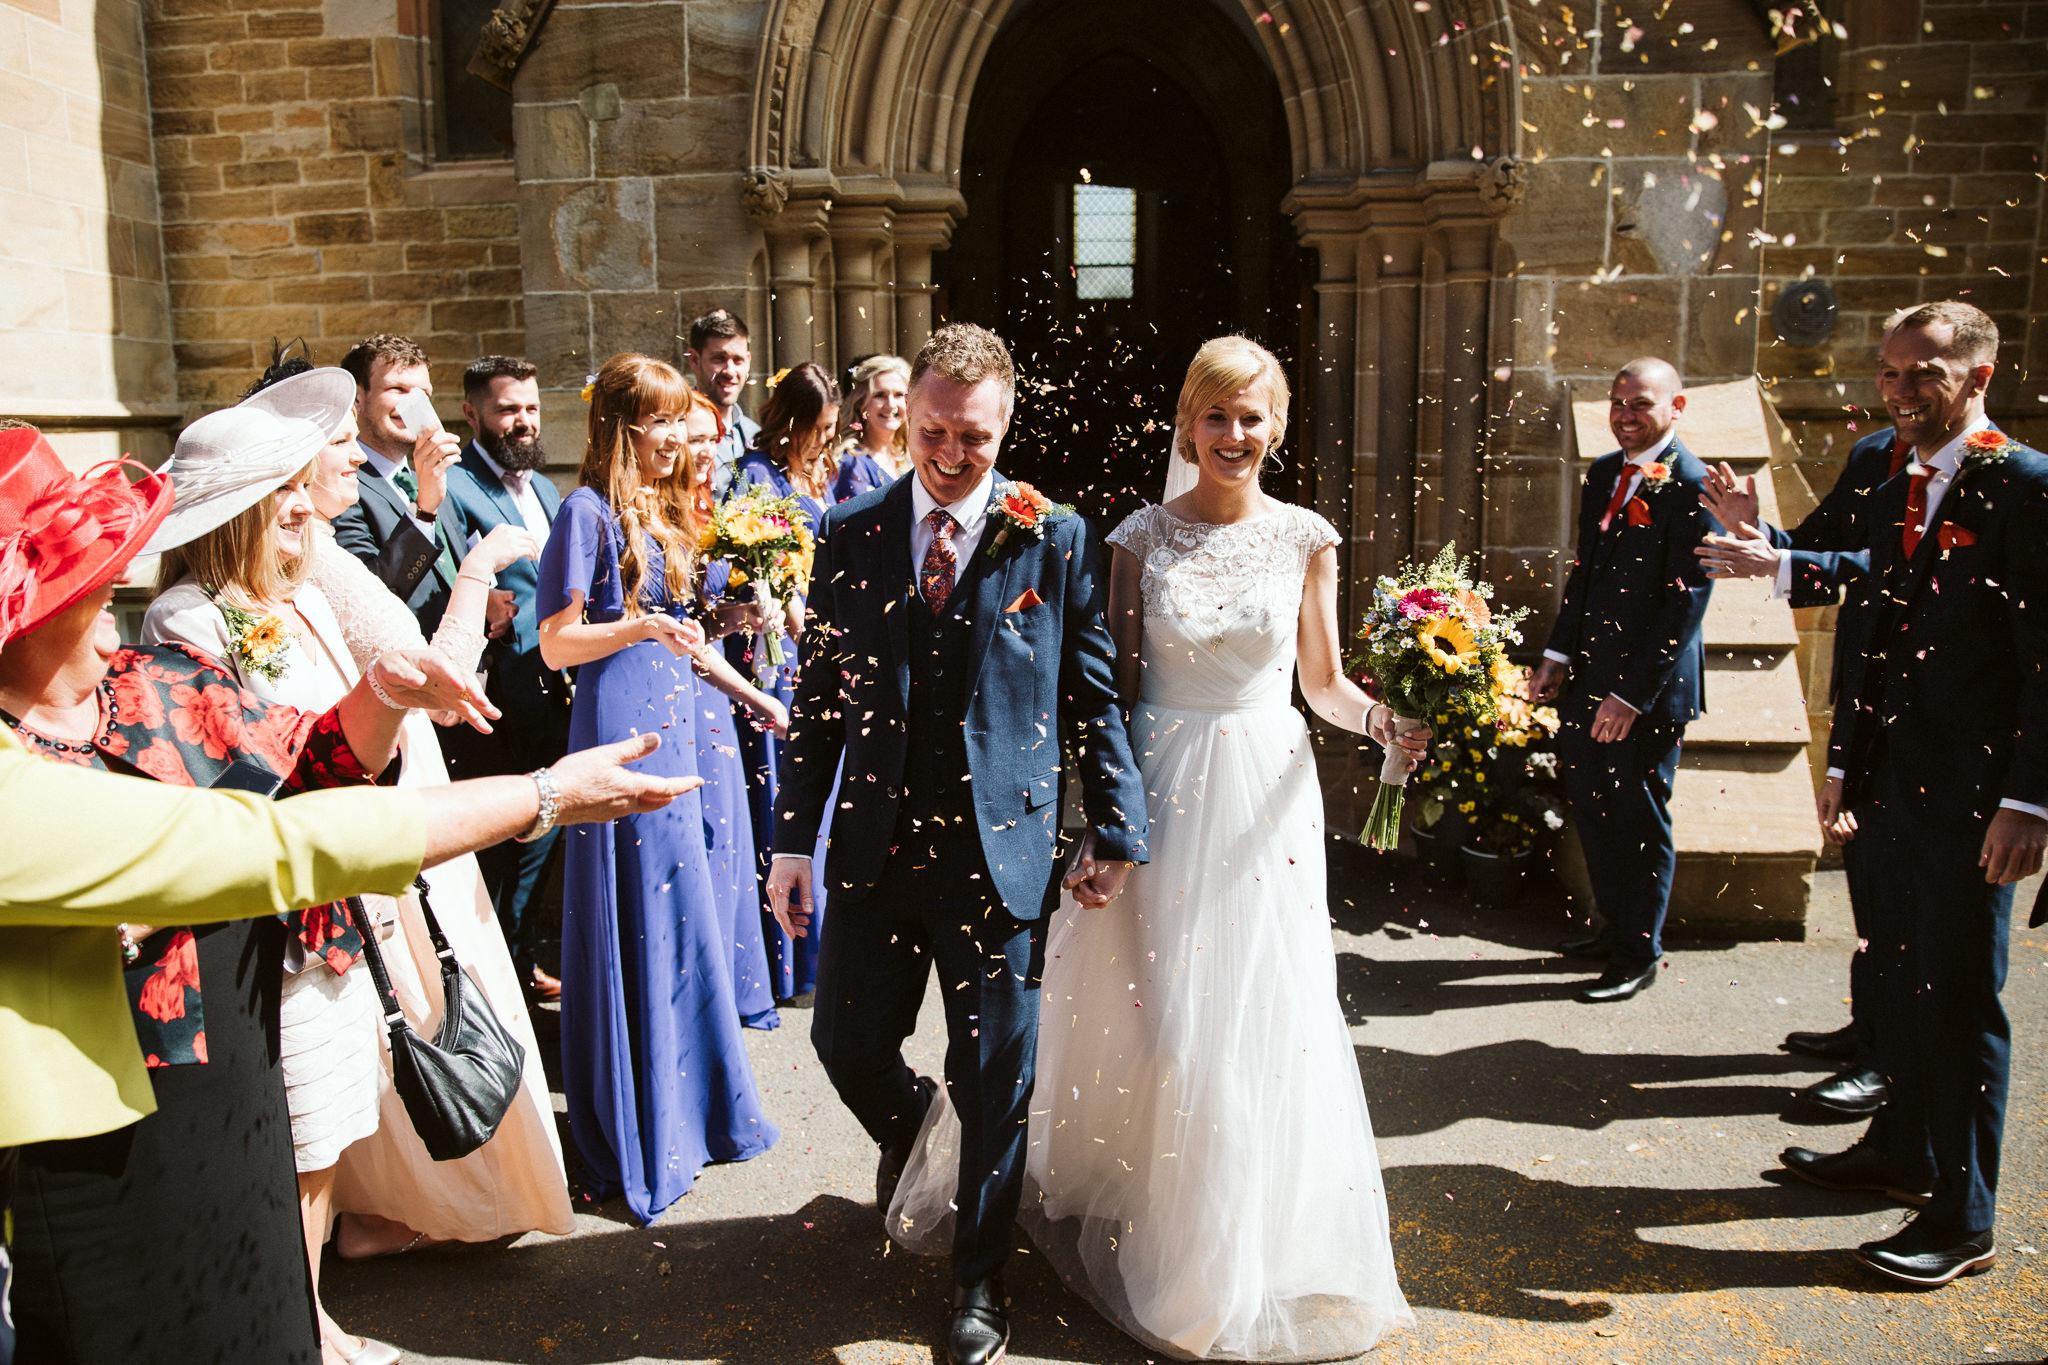 northside-farm-wedding-northumberland-margarita-hope (32).jpg